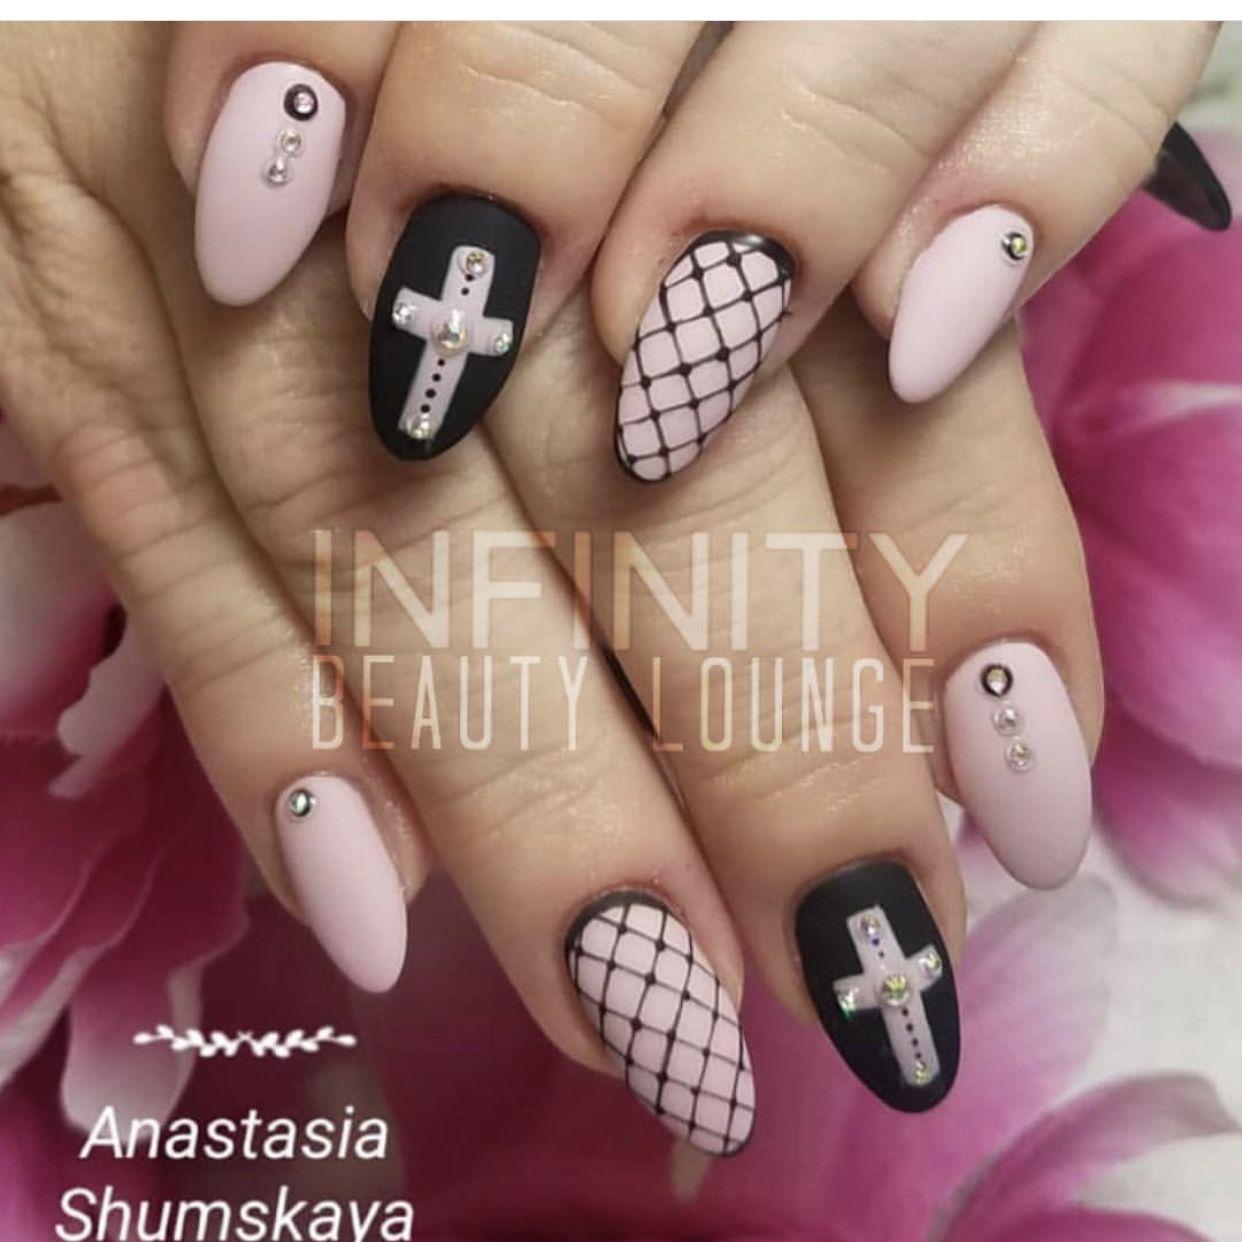 Infinity Beauty Lounge Jax Beauty lounge, Long nails